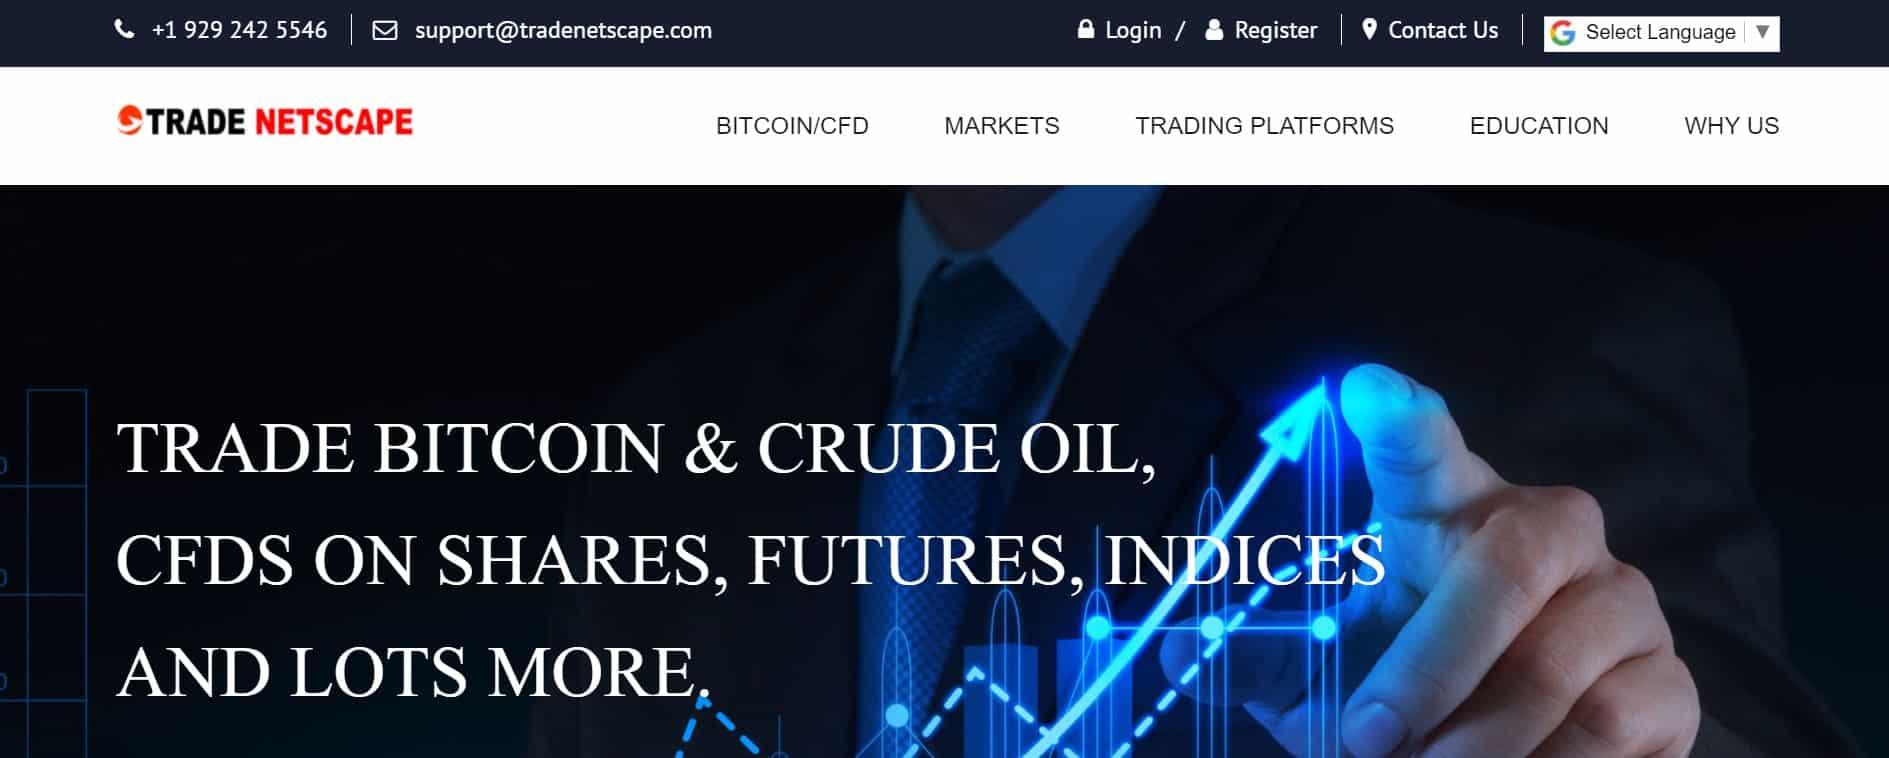 Trade Netscape website